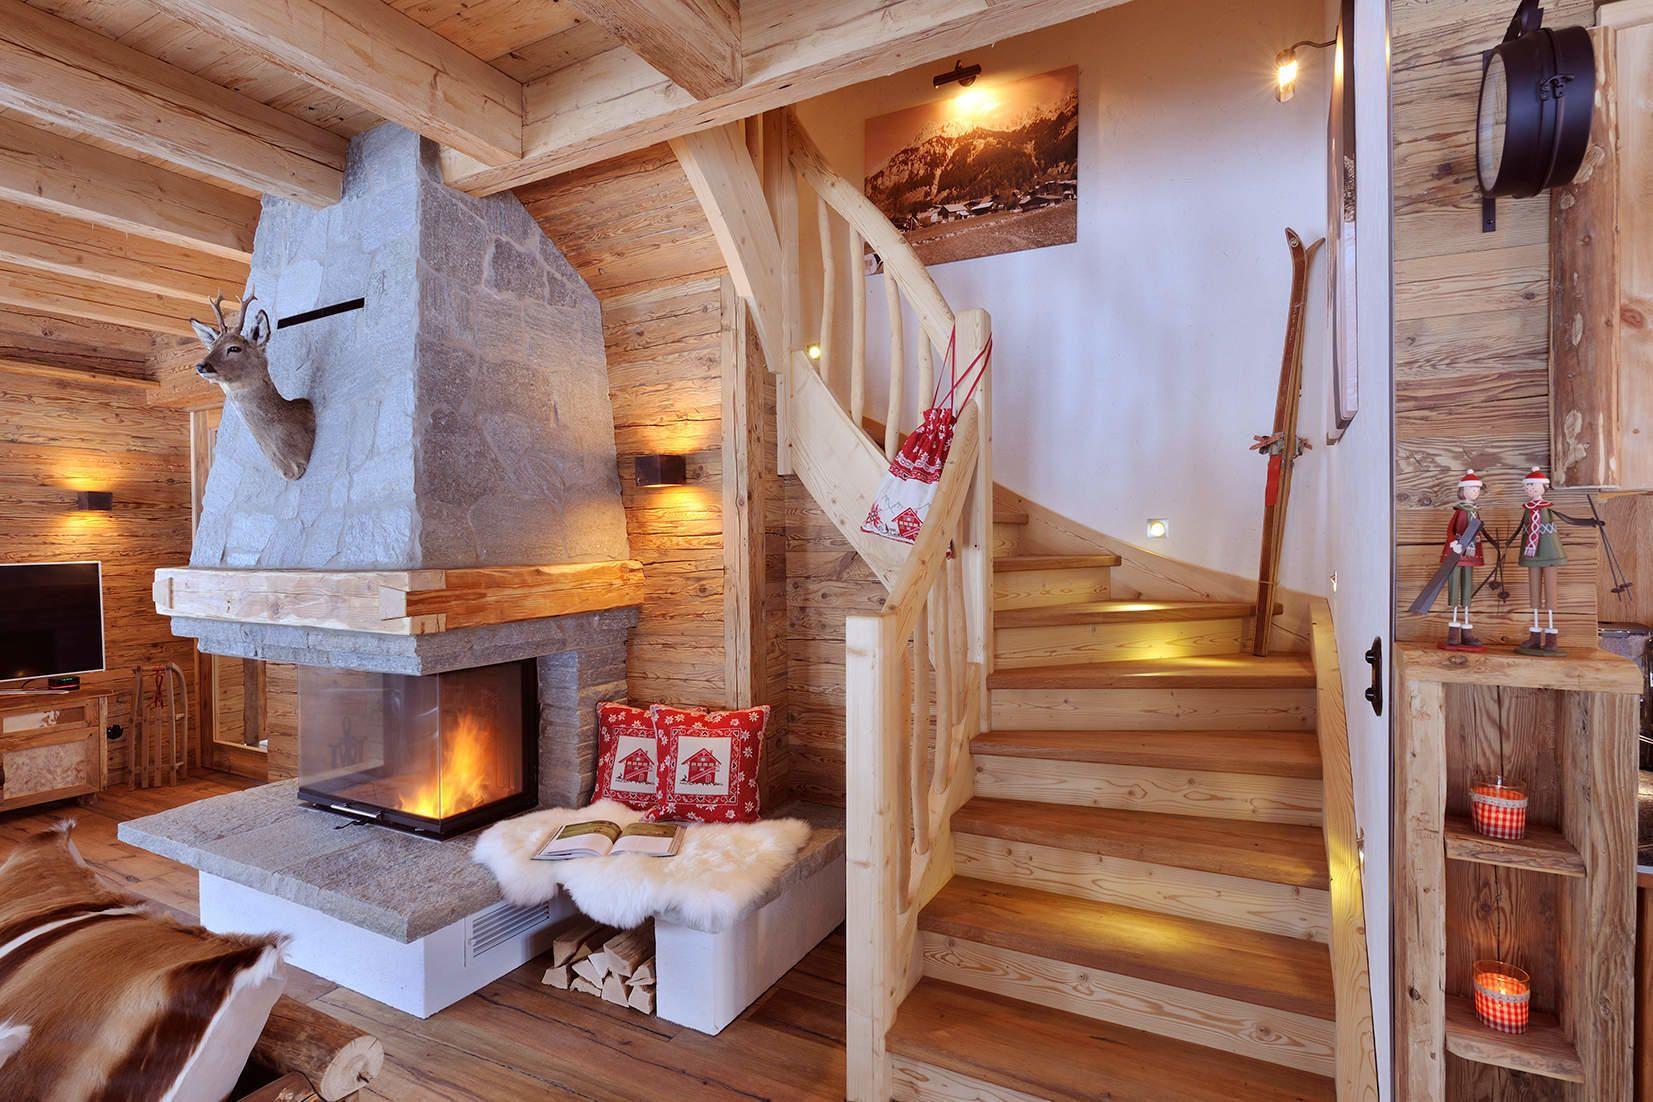 wohlf hl chalet chalet grand fl h tannheimer tal luxus chalets tirol ferienh user allg u ca. Black Bedroom Furniture Sets. Home Design Ideas